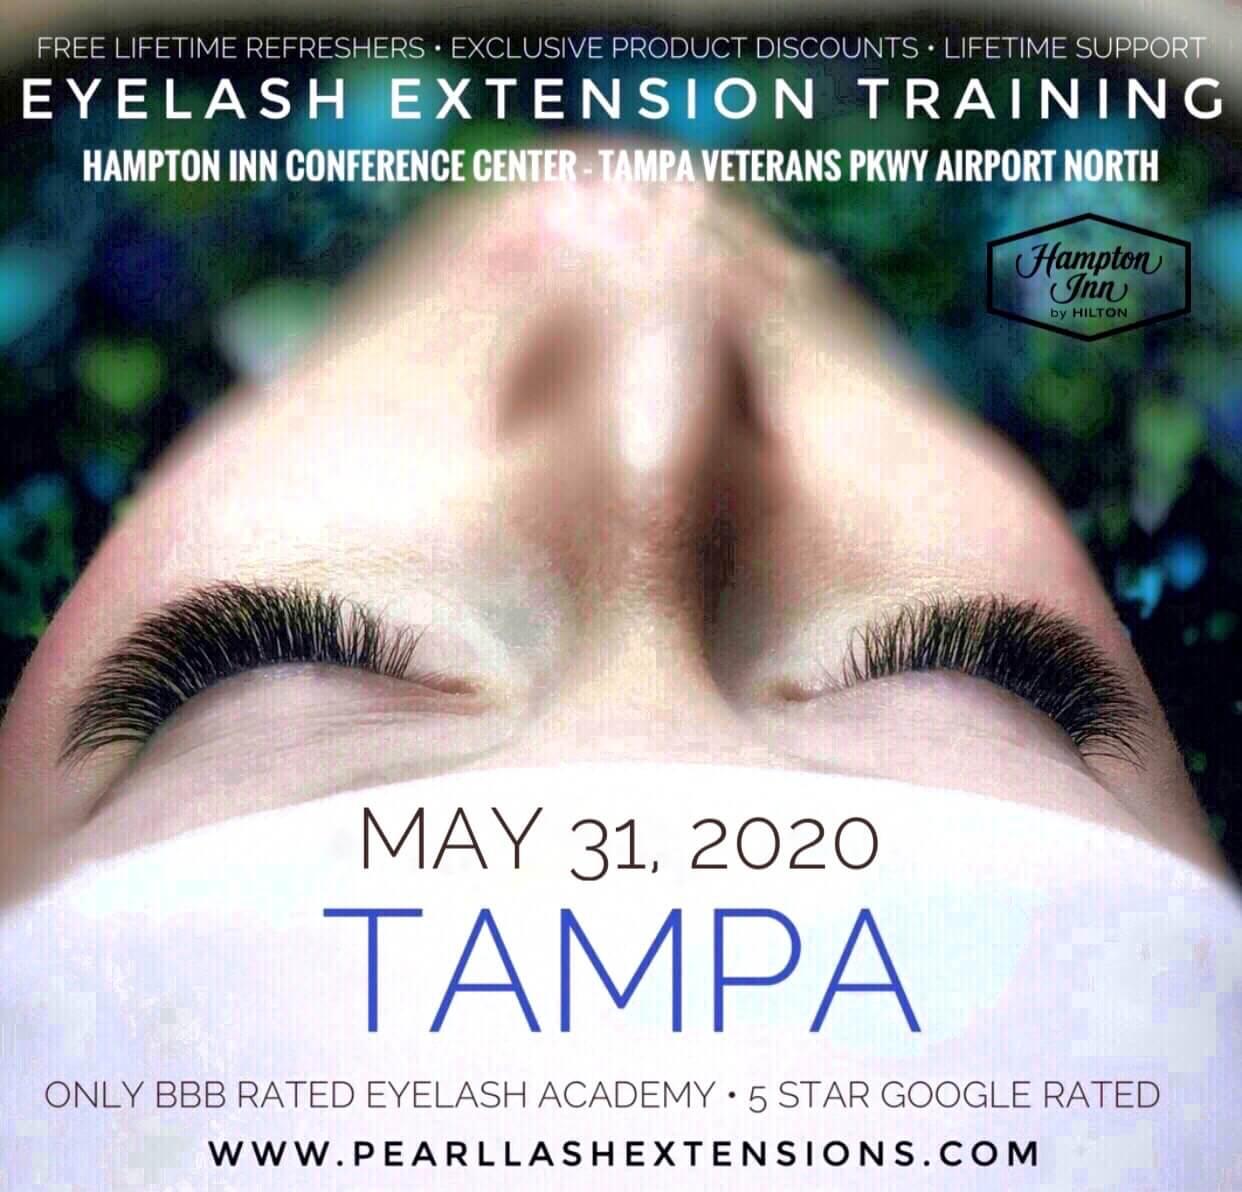 Tampa Eyelash Extension Classic Training by Pearl Lash